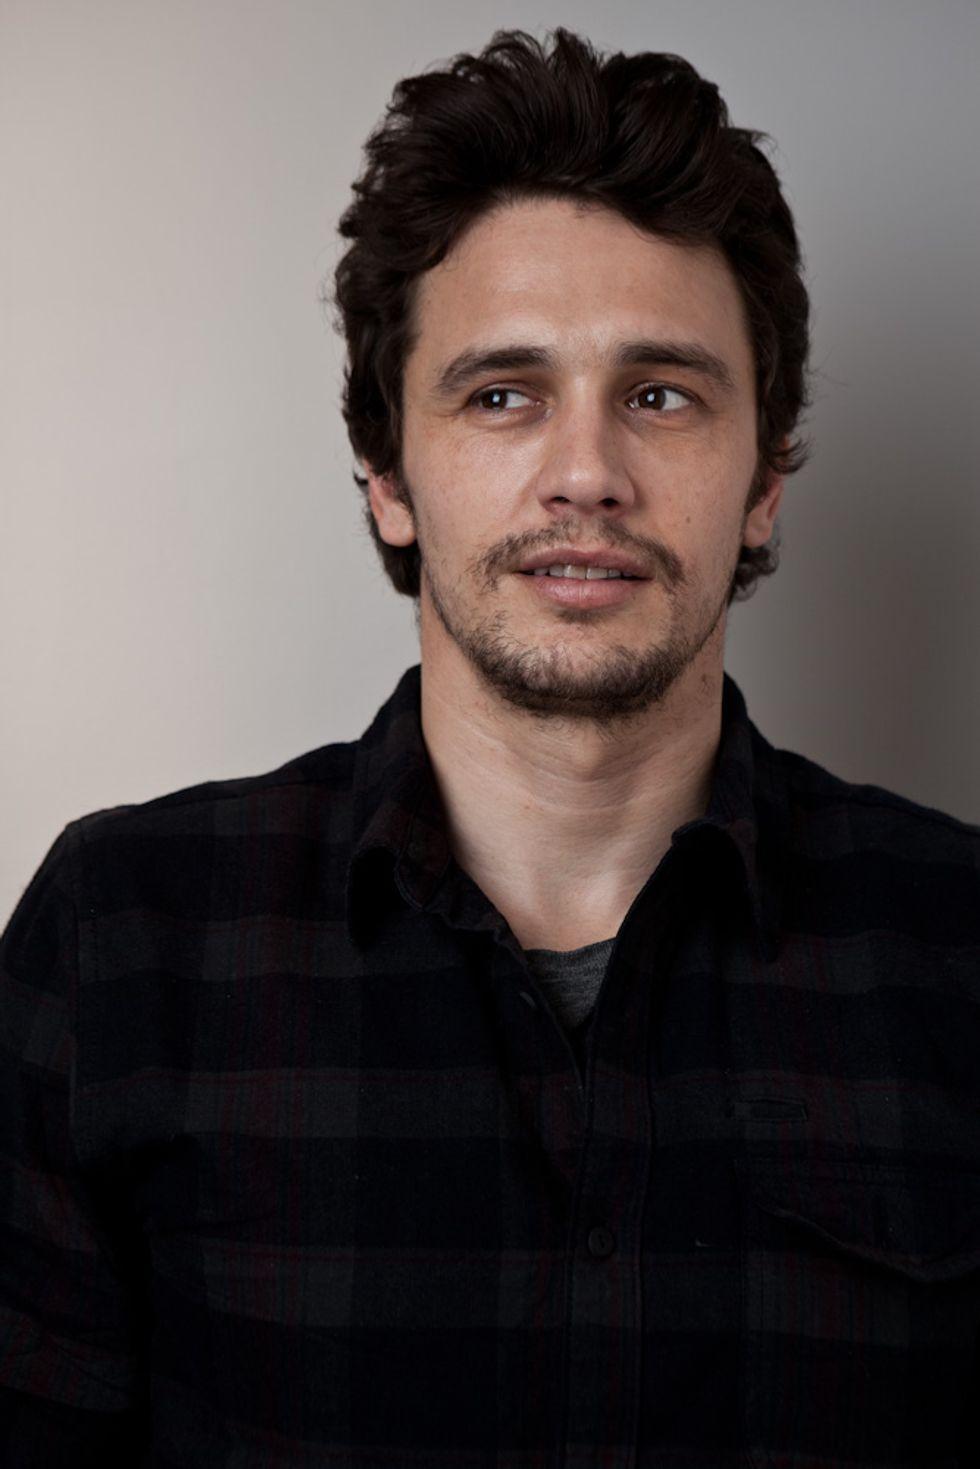 Henny Garfunkel Captures the Stars, Directors and Break-Outs of Sundance 2013